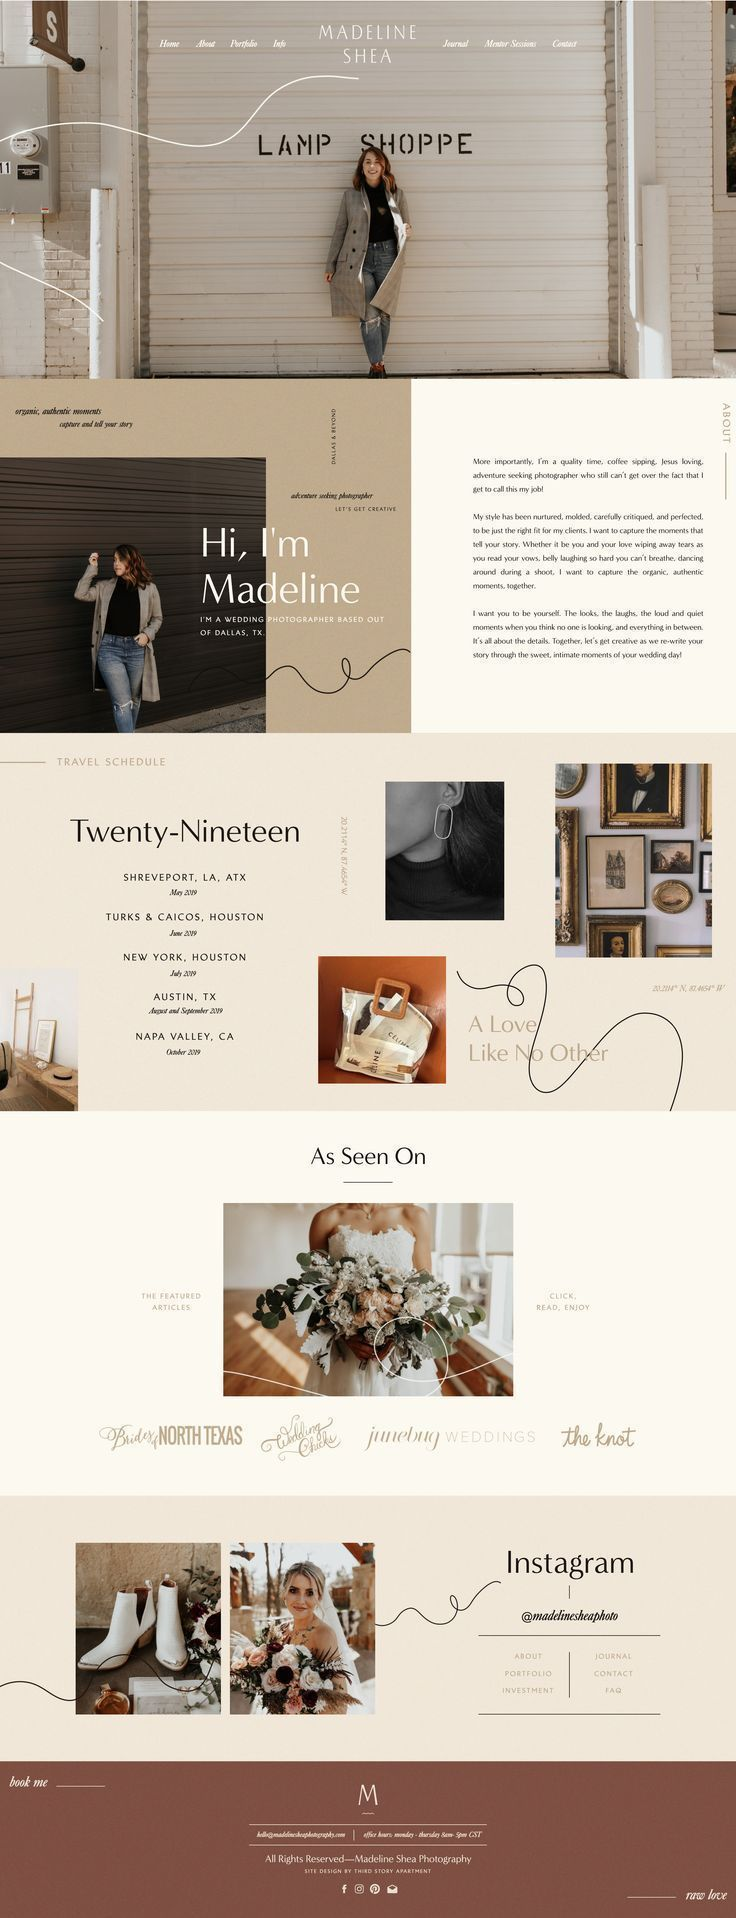 Pin By Taylor Walden On Web Design Portfolio Website Design Website Design Layout Portfolio Web Design